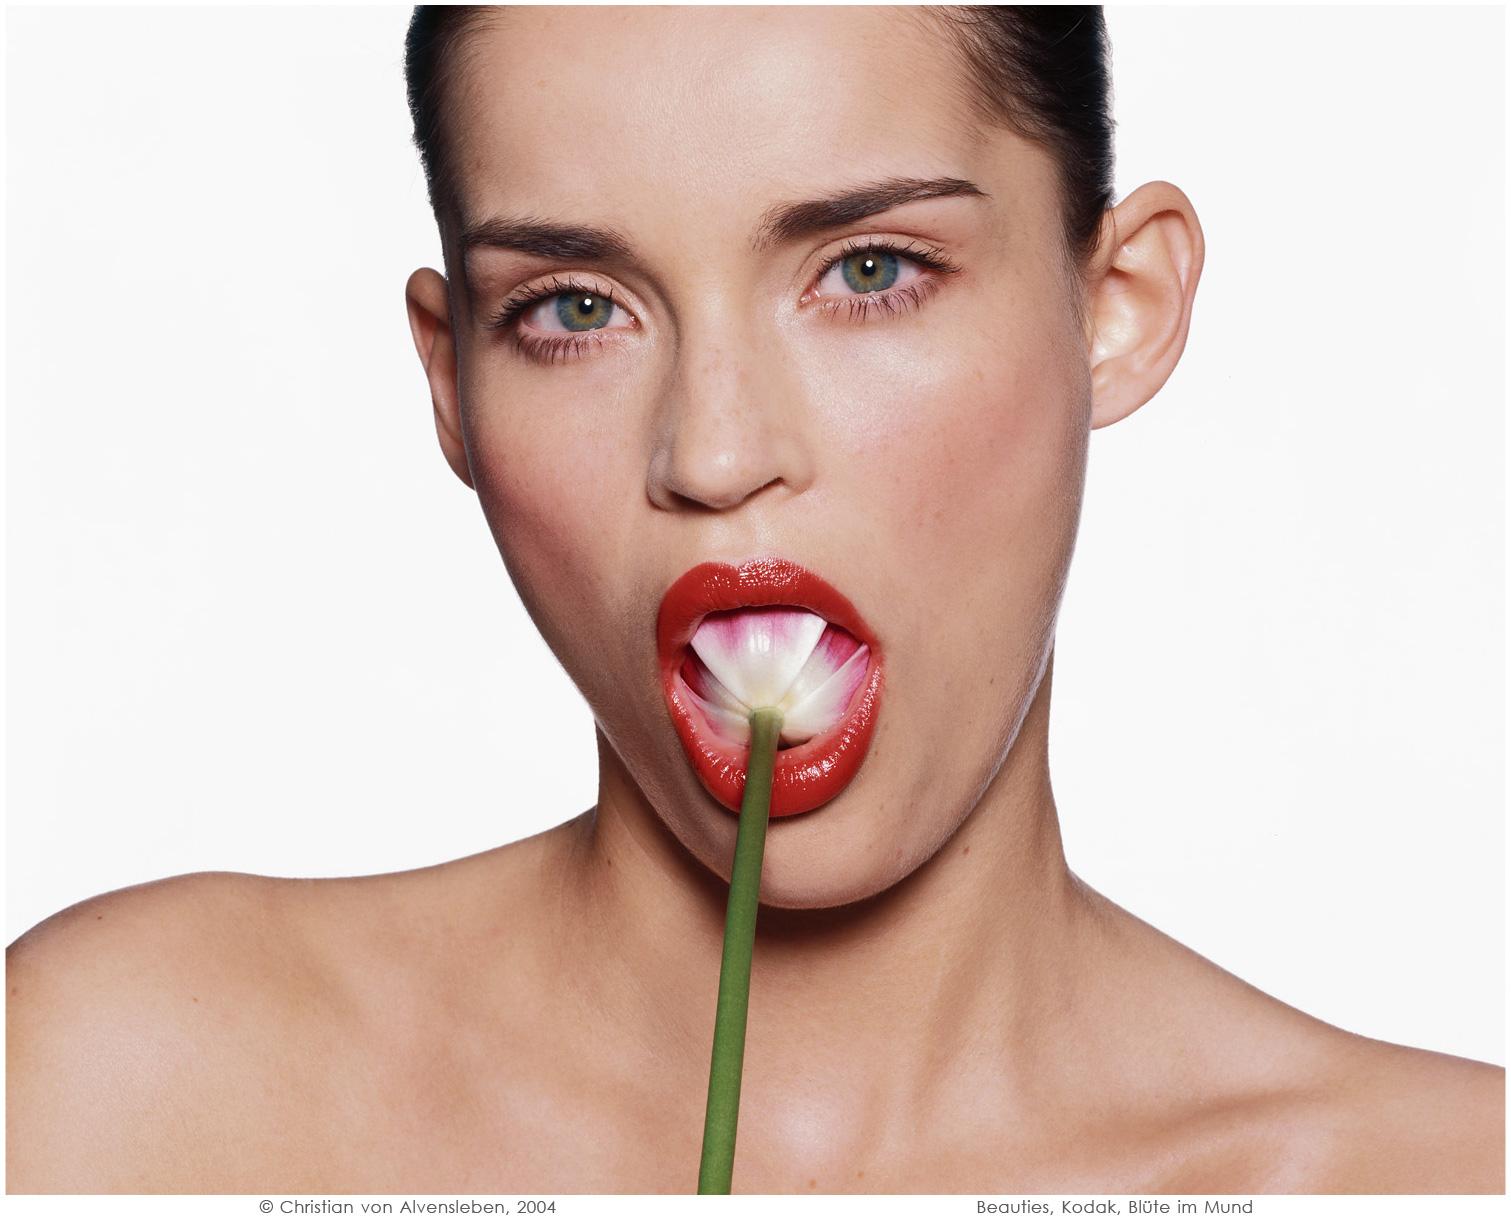 Beauties, Kodak, Blüte im Mund